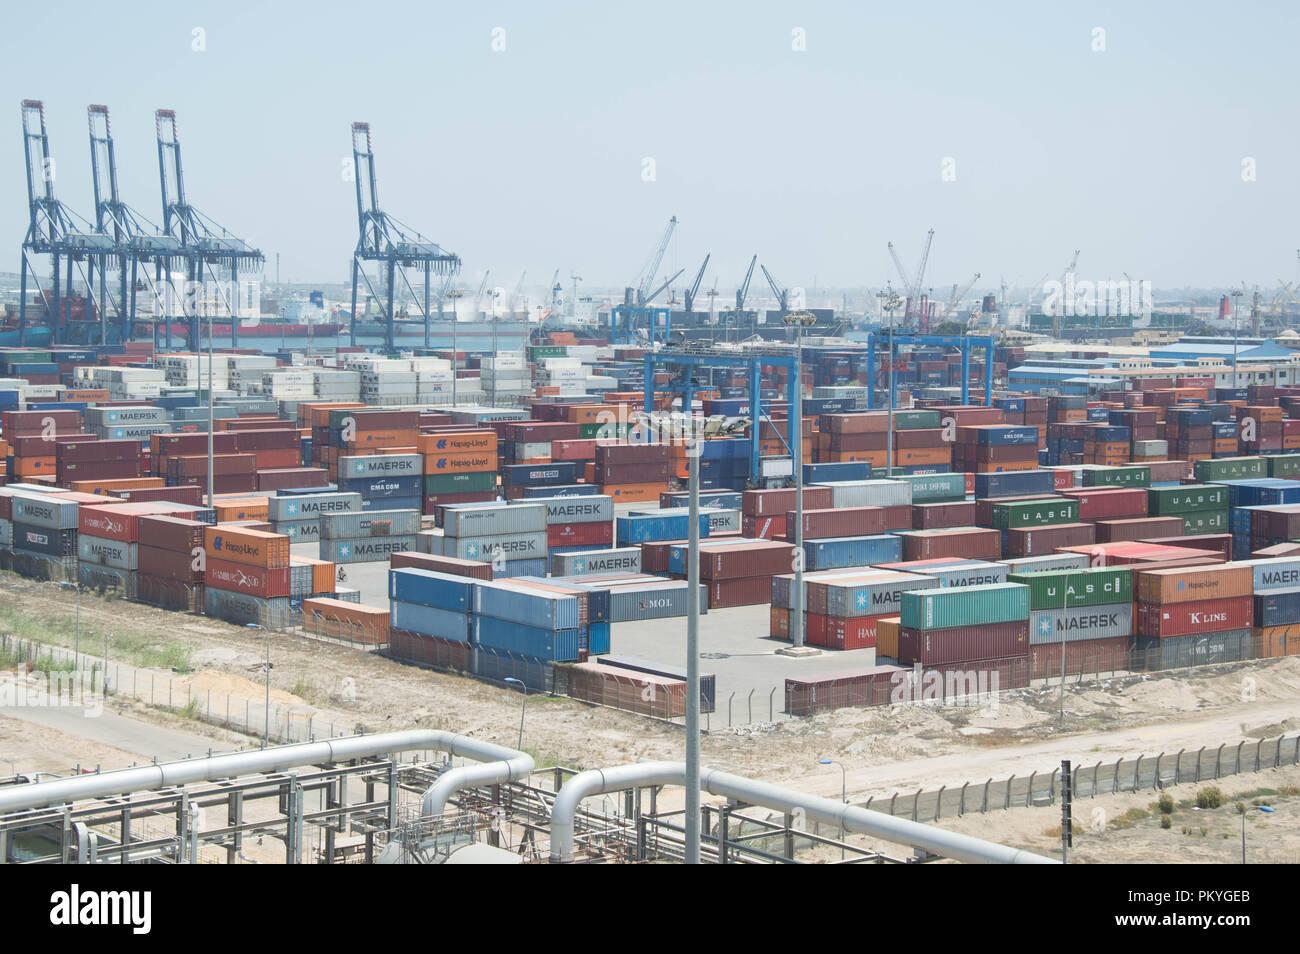 the damietta container port operated by the damietta port authority rh alamy com